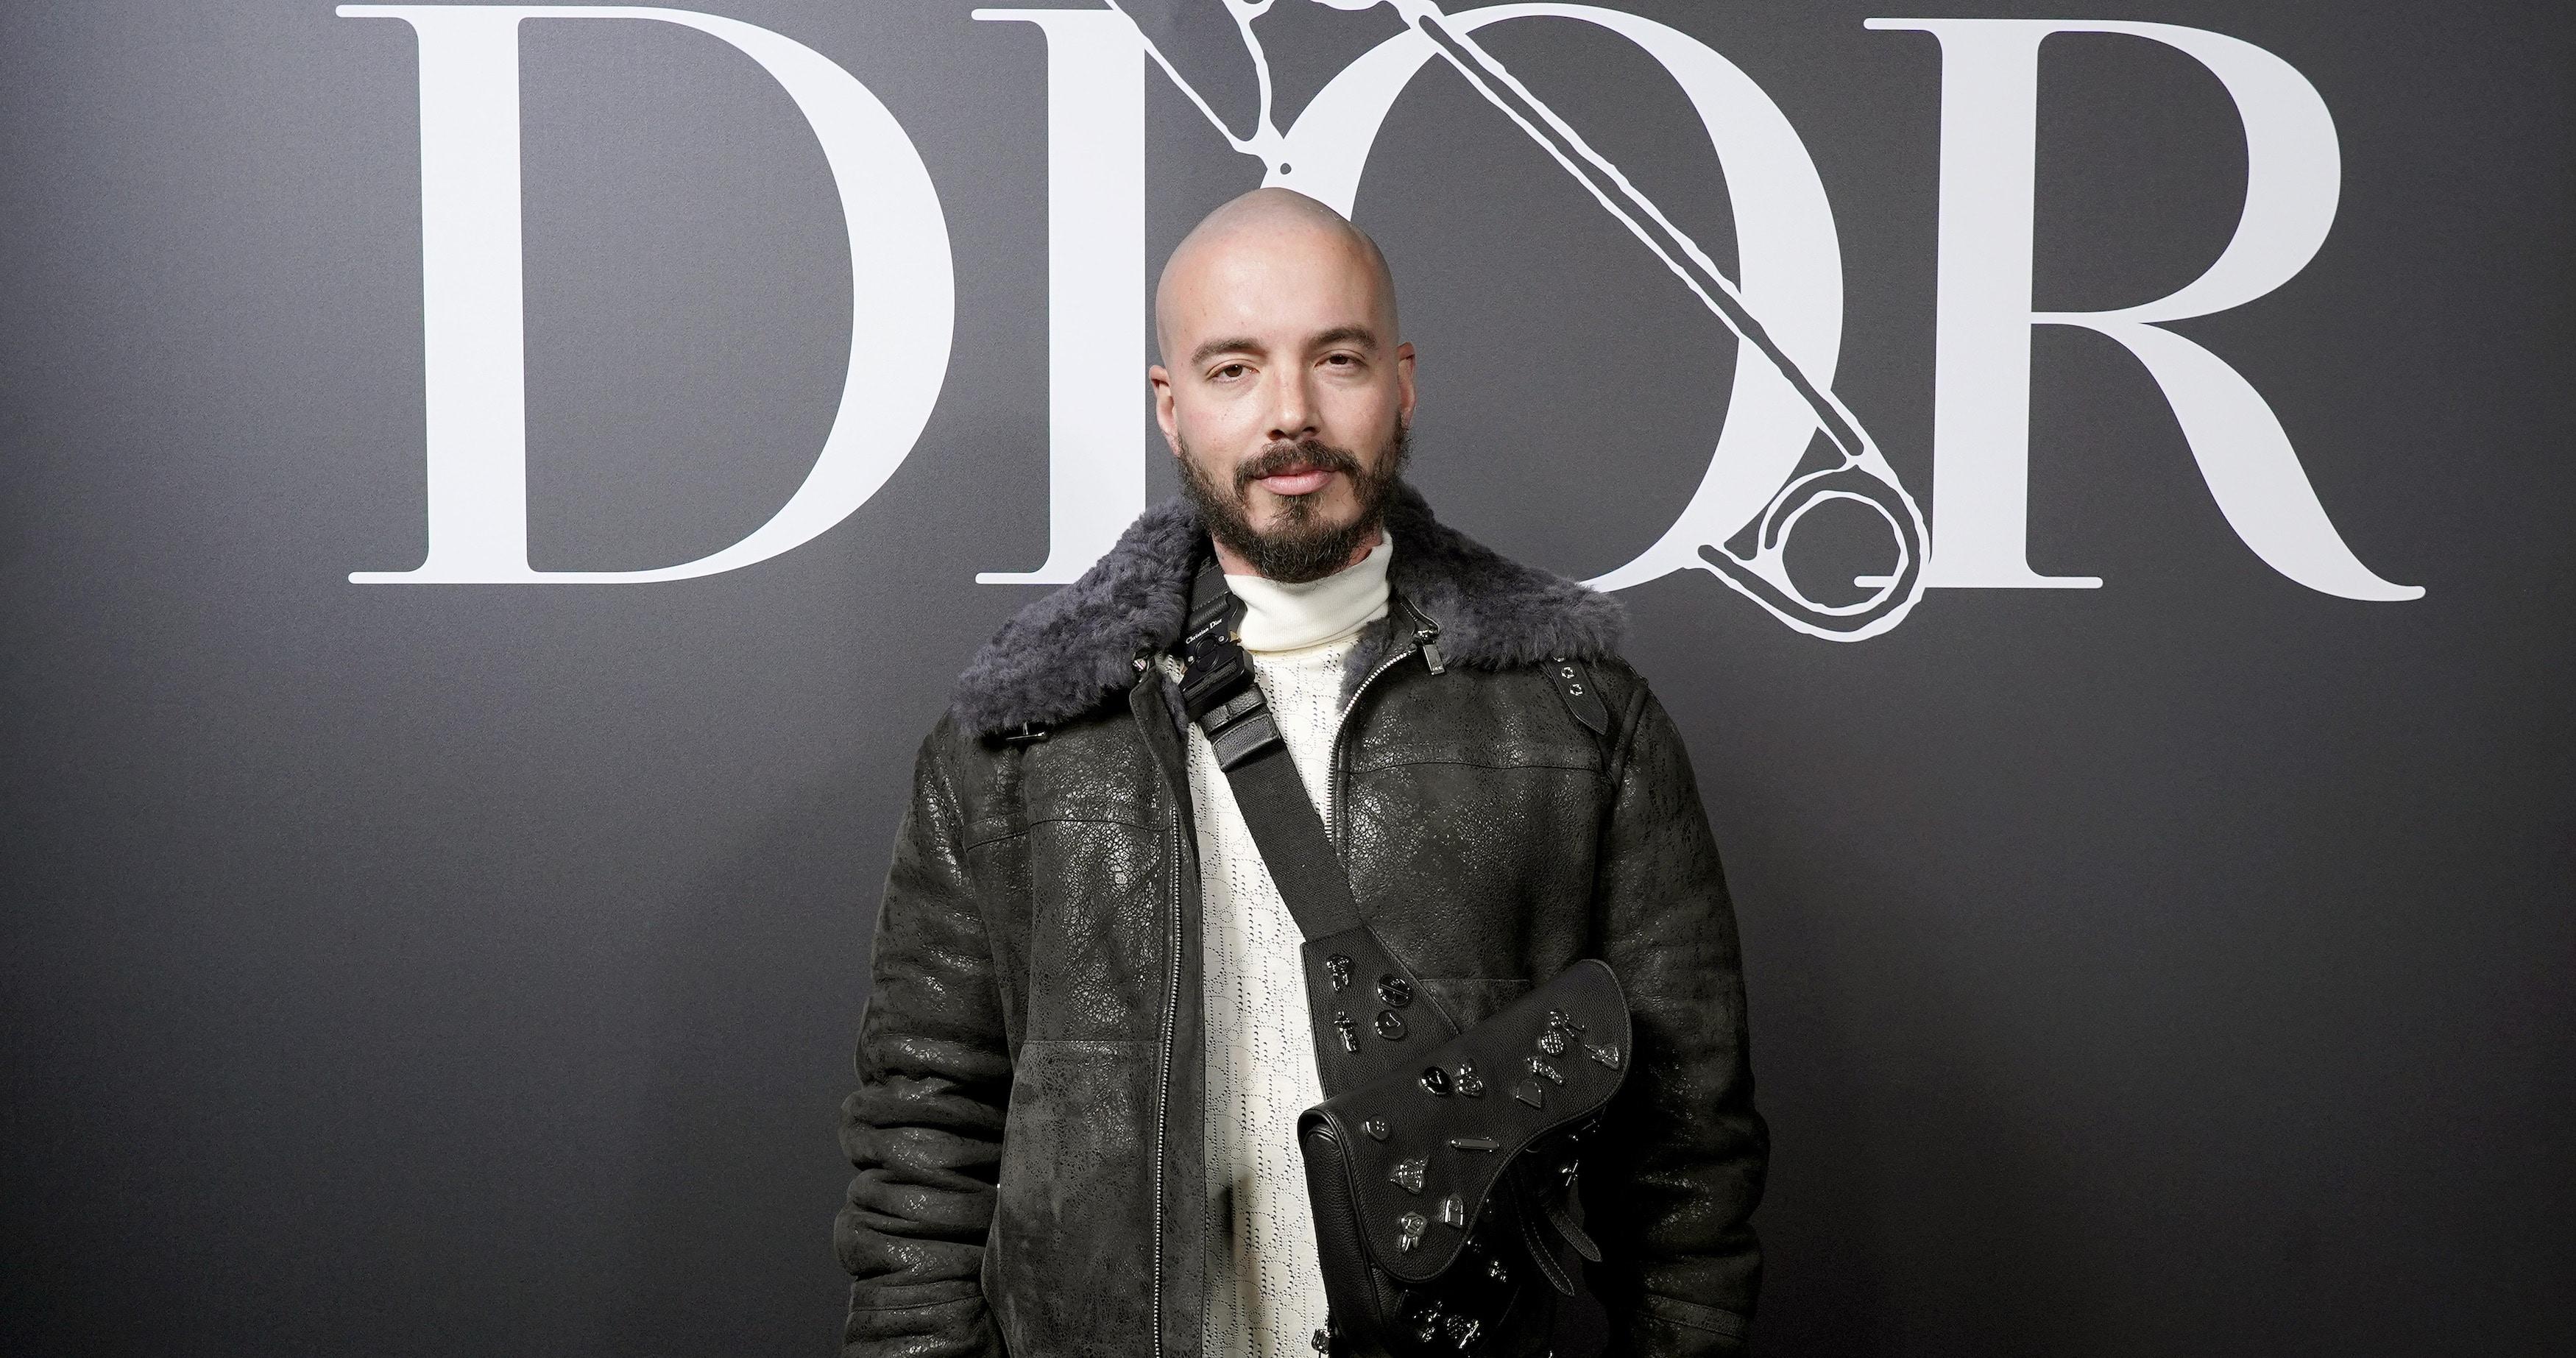 J Balvin Is the Most Global Latin Artist, According to Premio Lo Nuestro